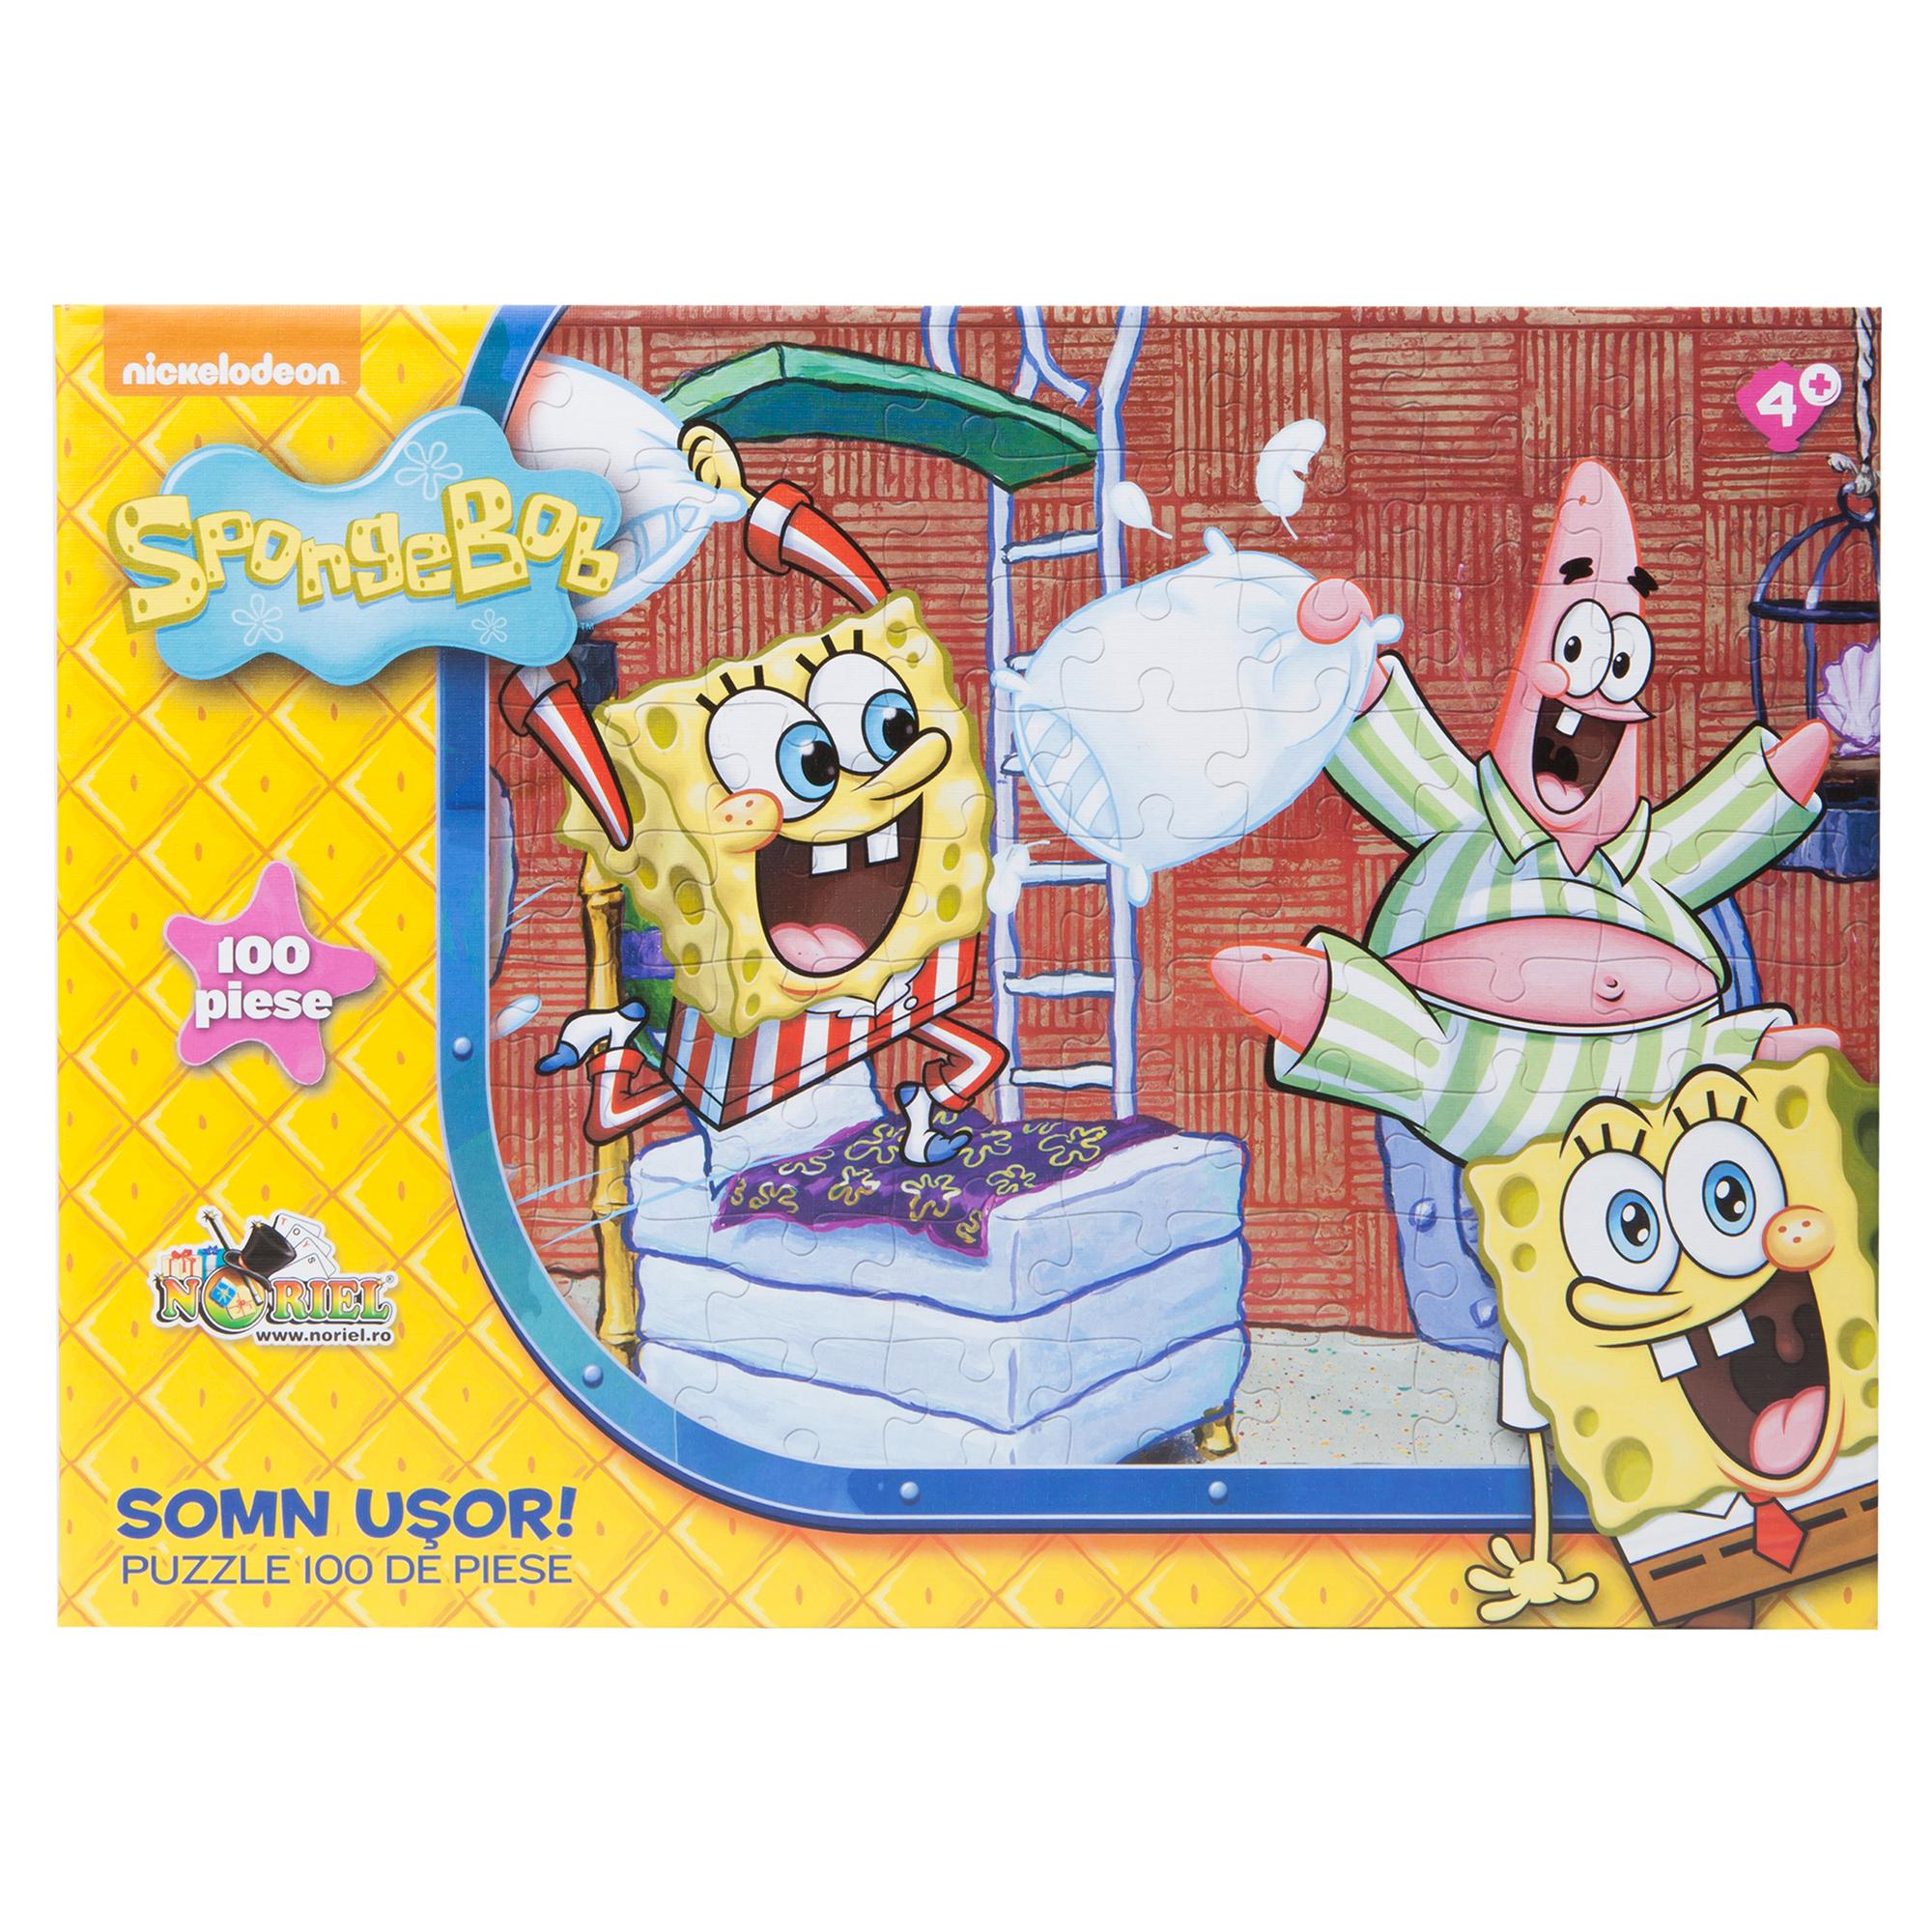 puzzle spongebob - somn usor! 100 piese